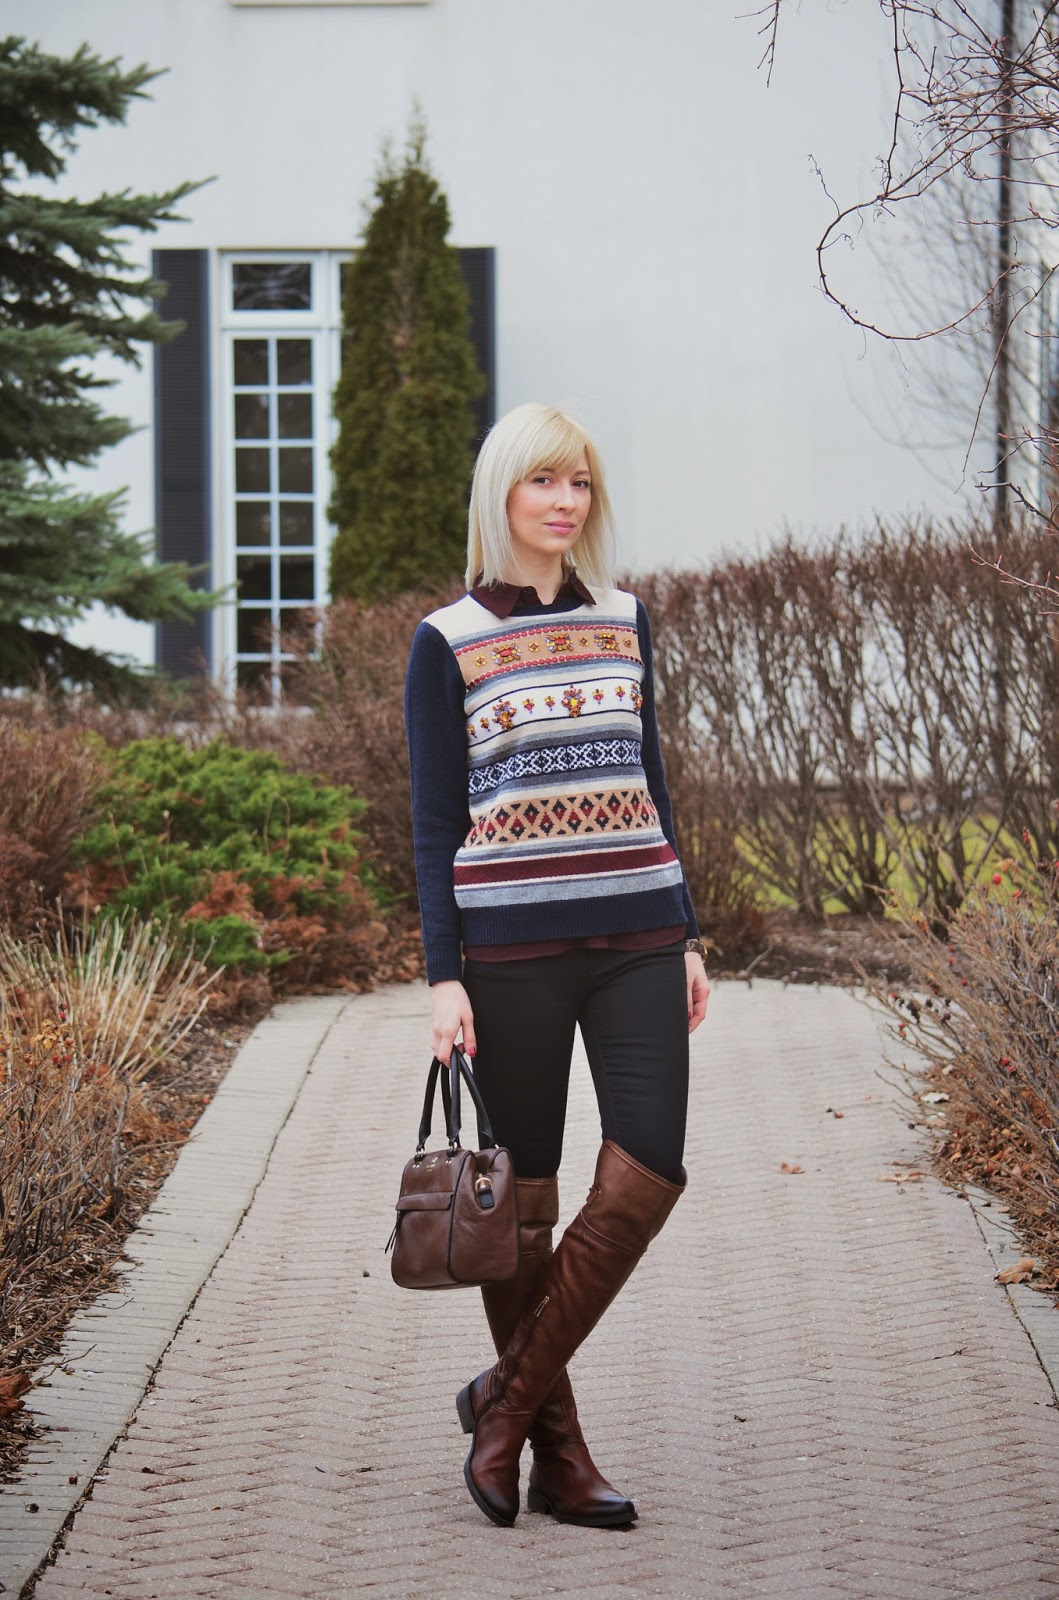 Style, fair isle, sweater, J. Crew, Kate Spade, Kate Spade bag, black and brown, casual Friday, fair isle sweater, fair isle sweater style, jcrew style